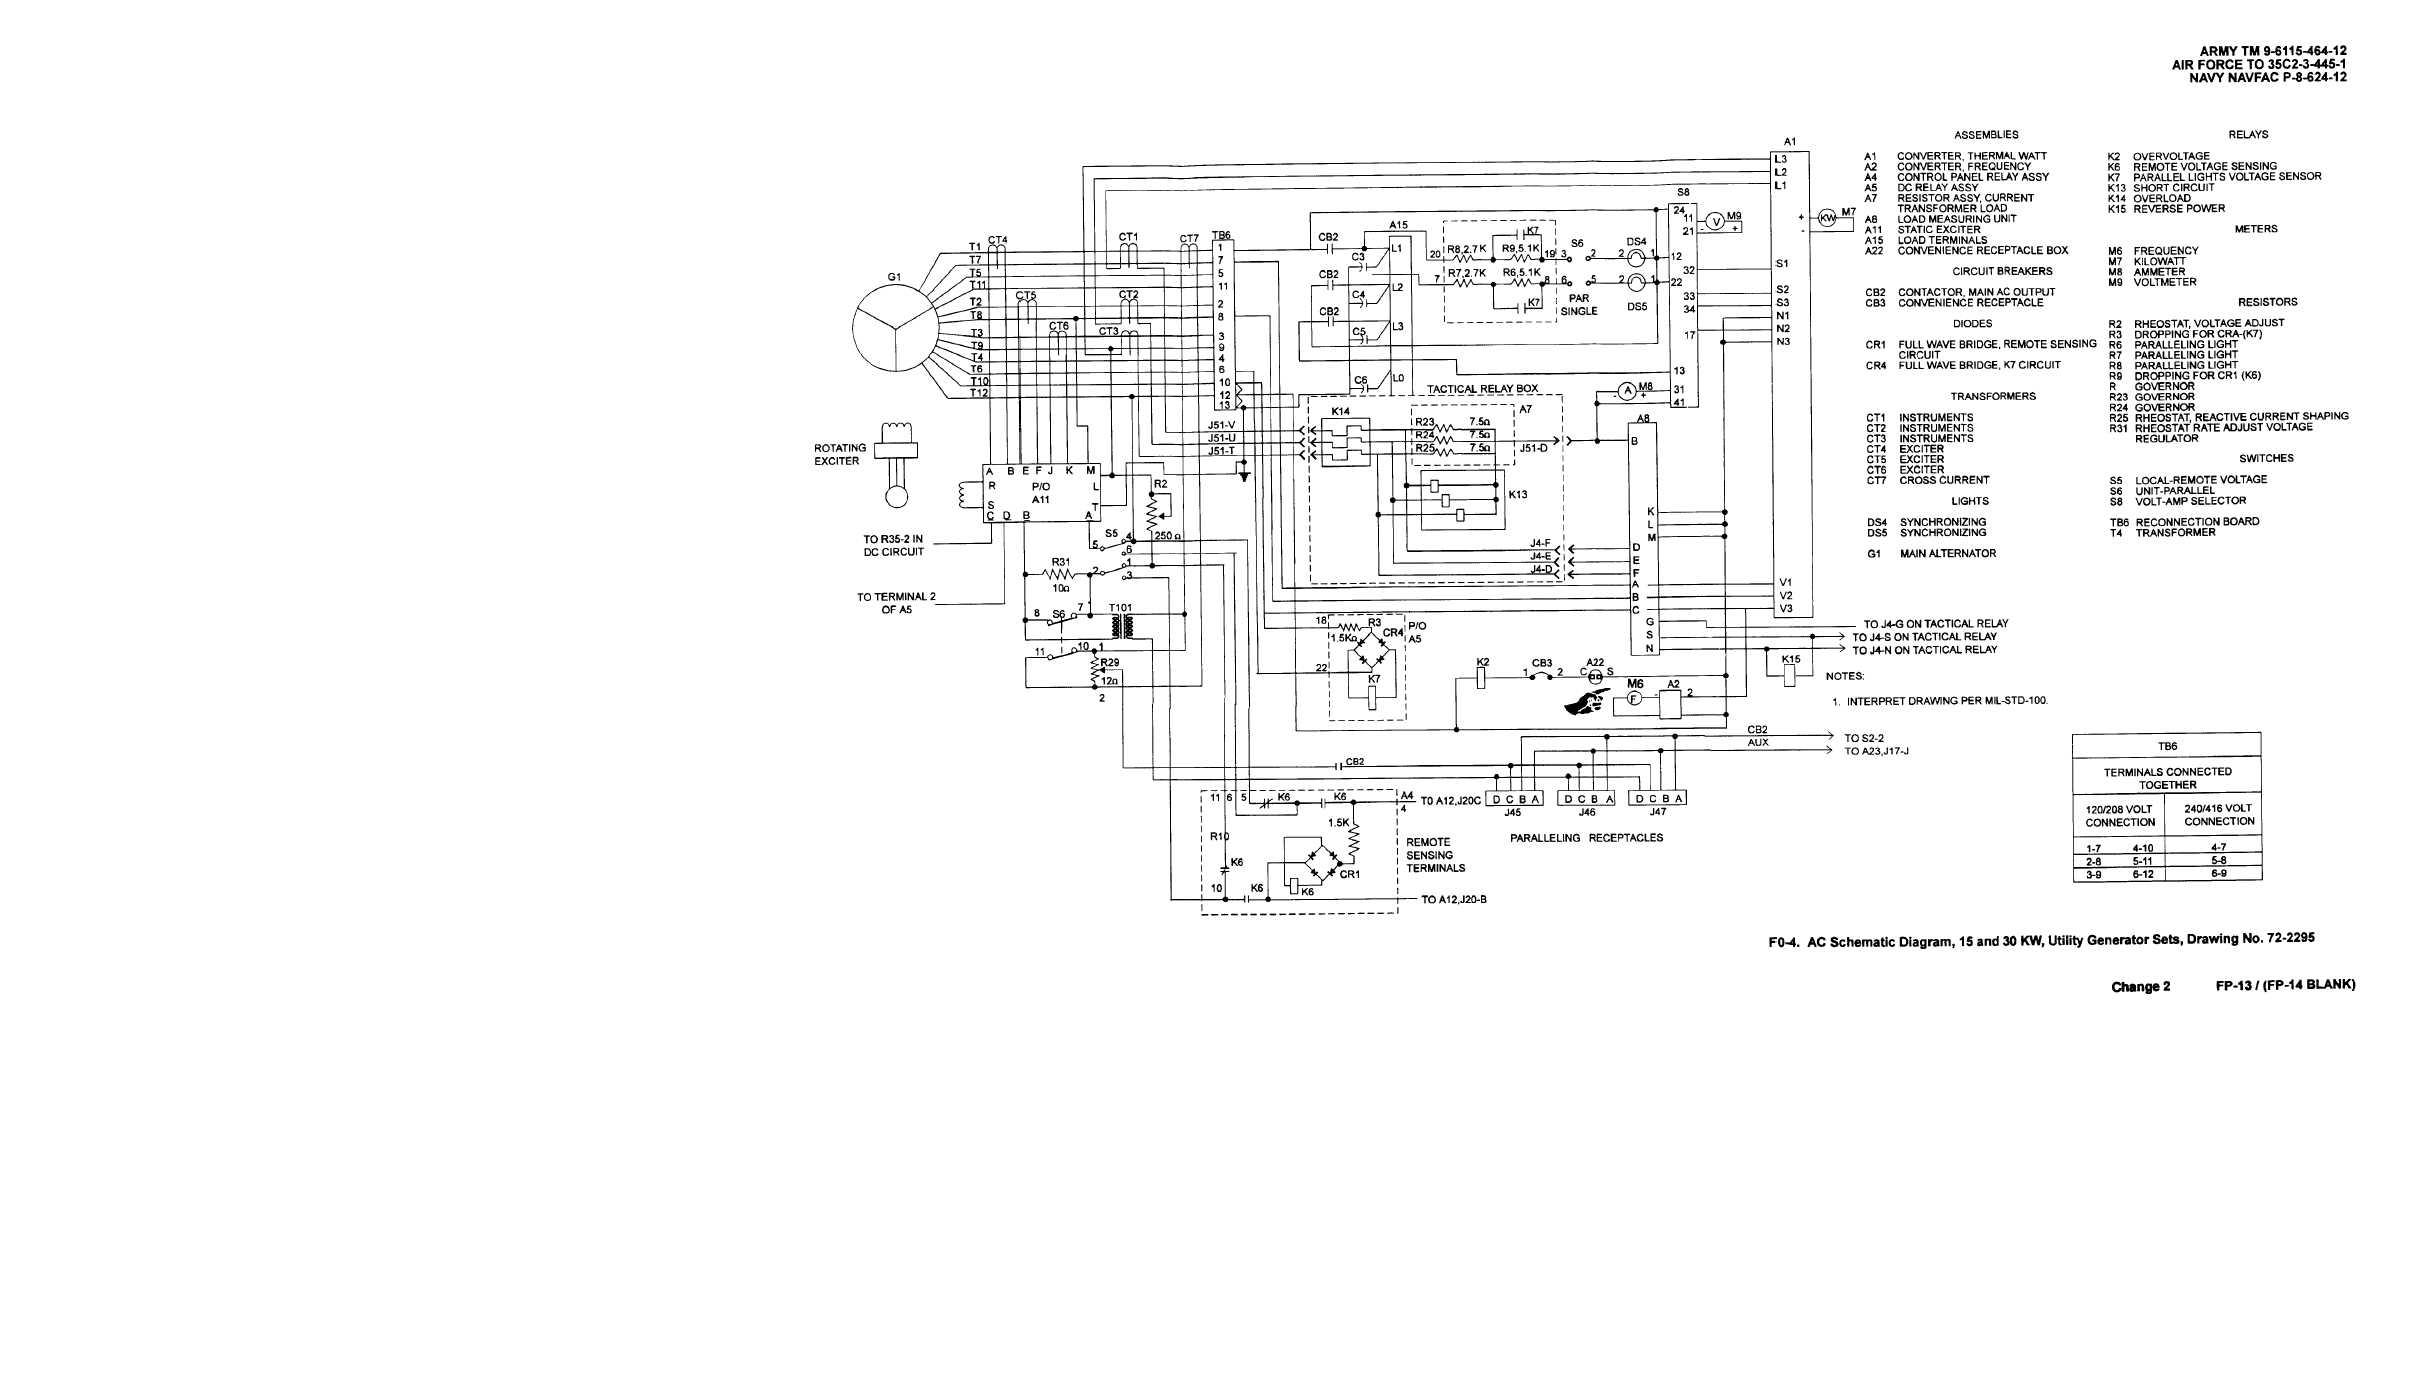 Fo 3 Ac Schematic Diagram 15 And 30 Kw Precise